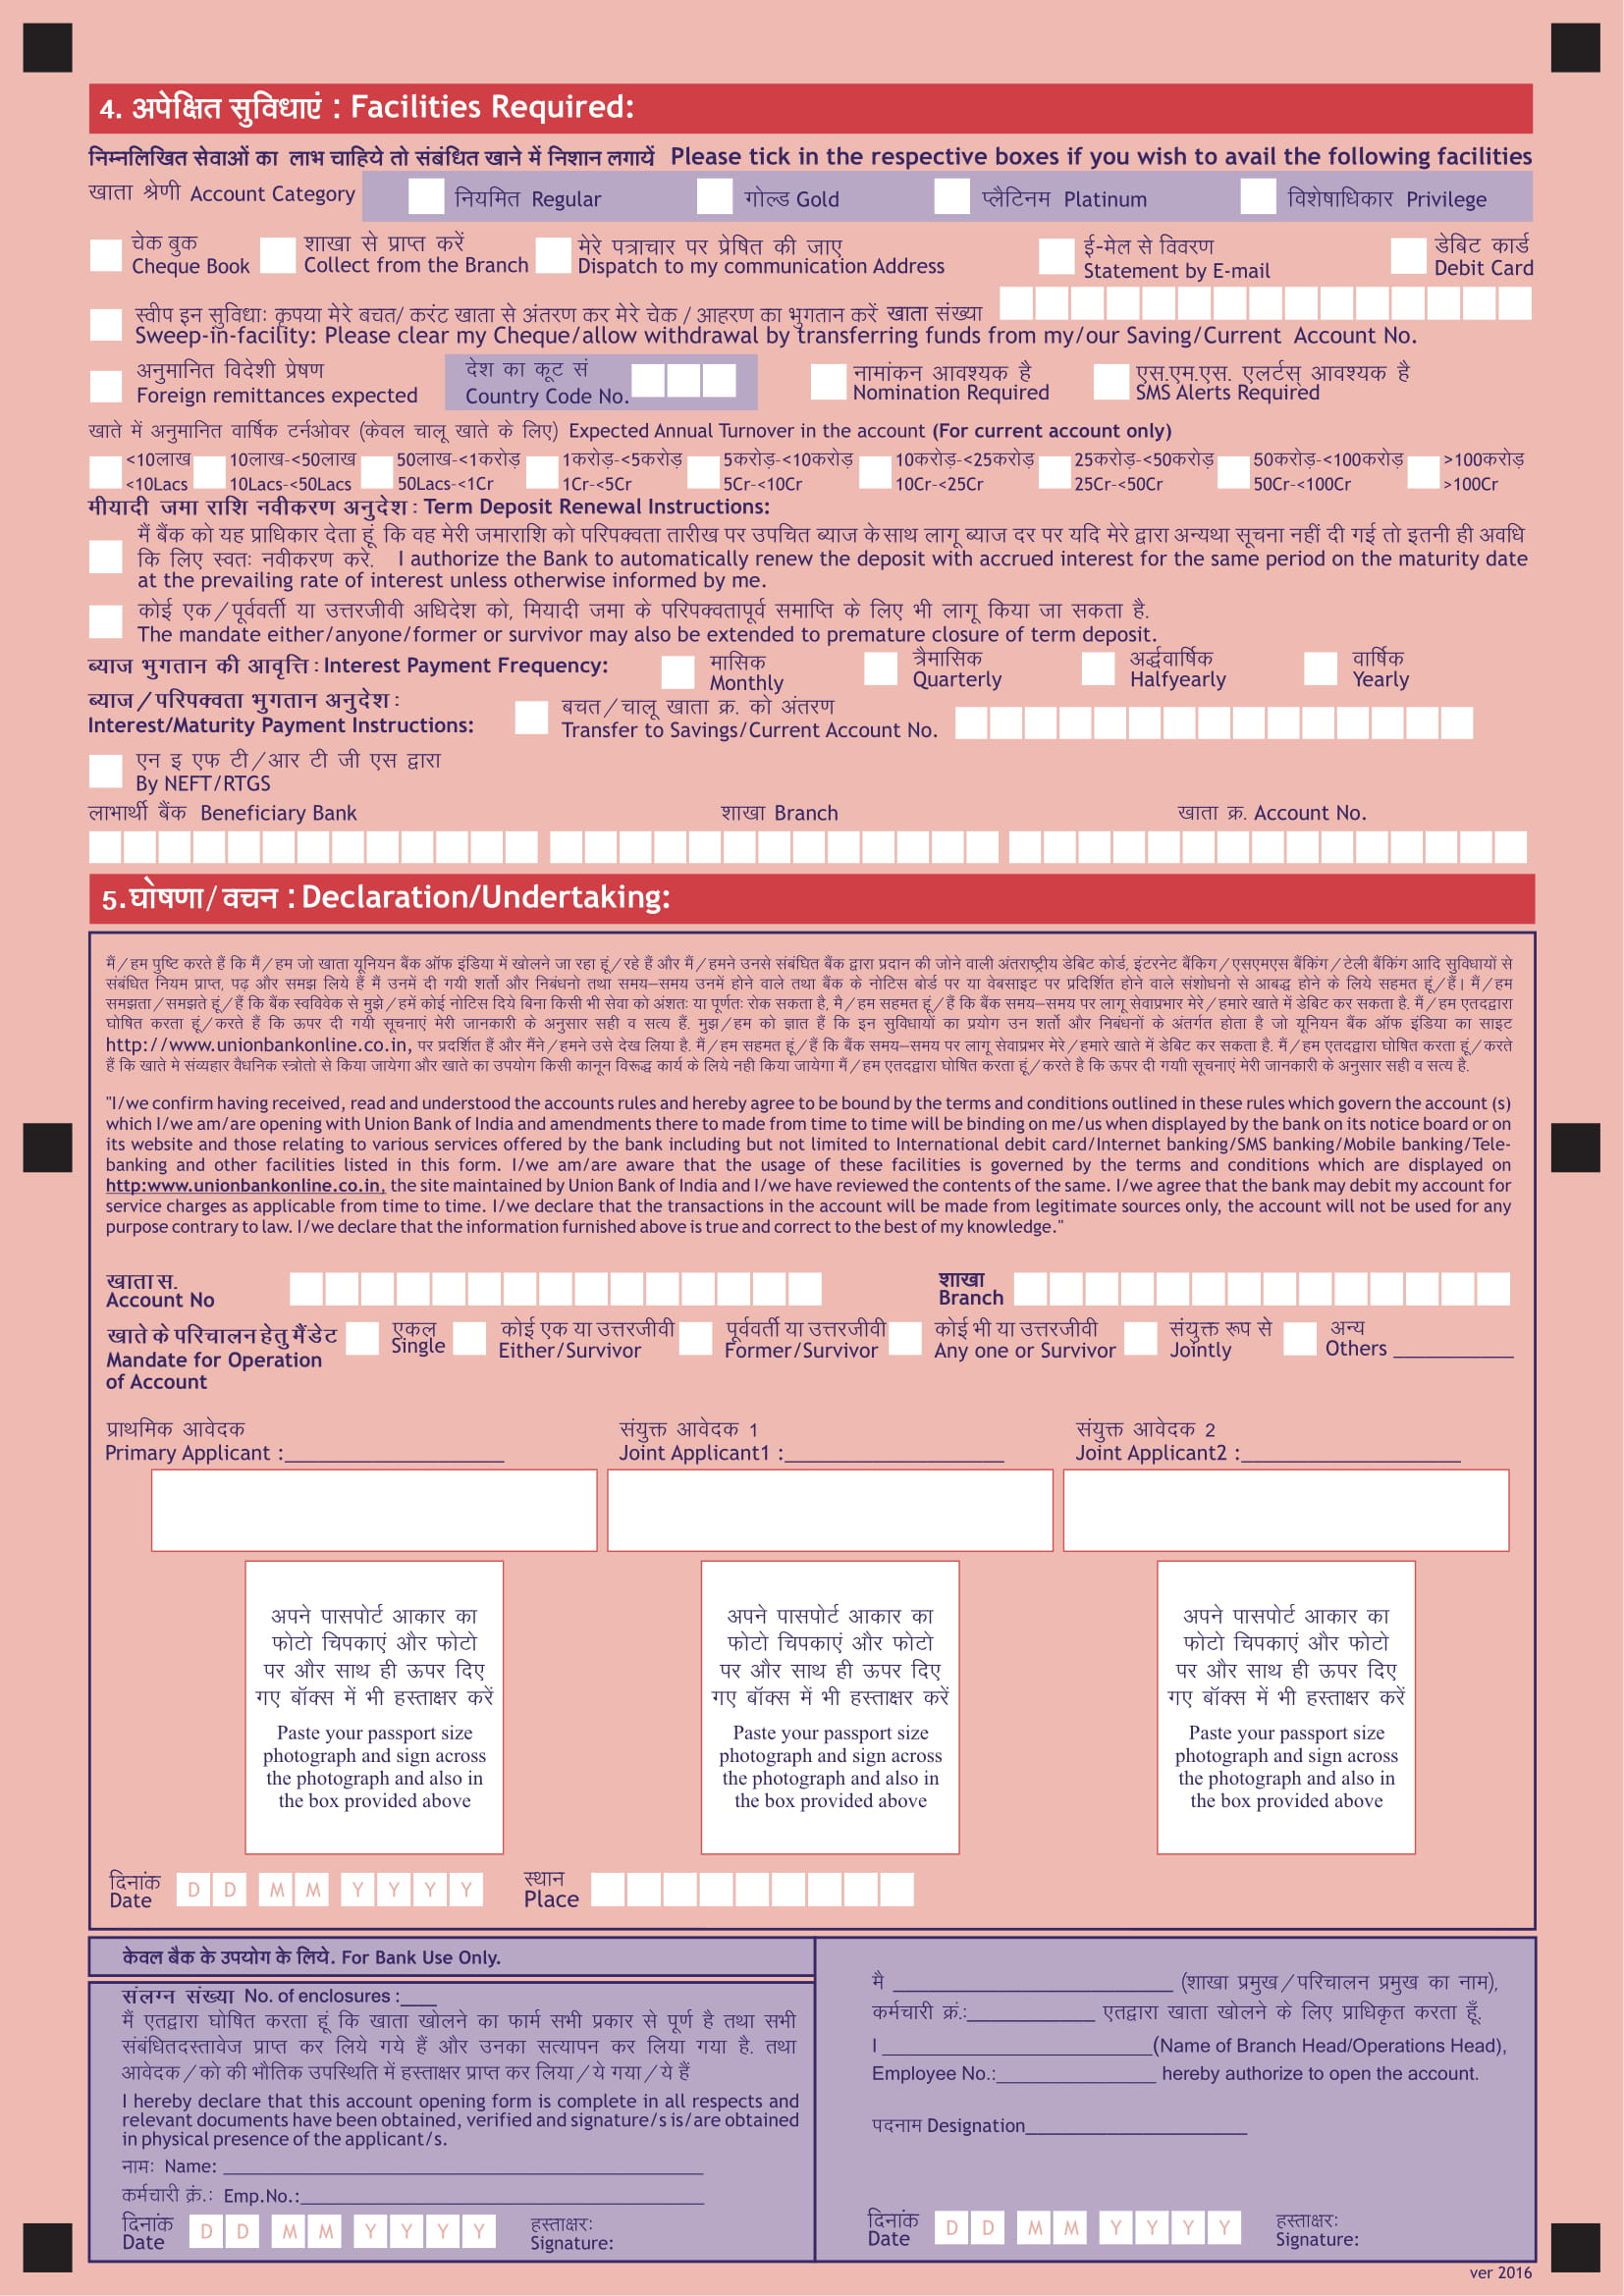 UBI Account opening form-2